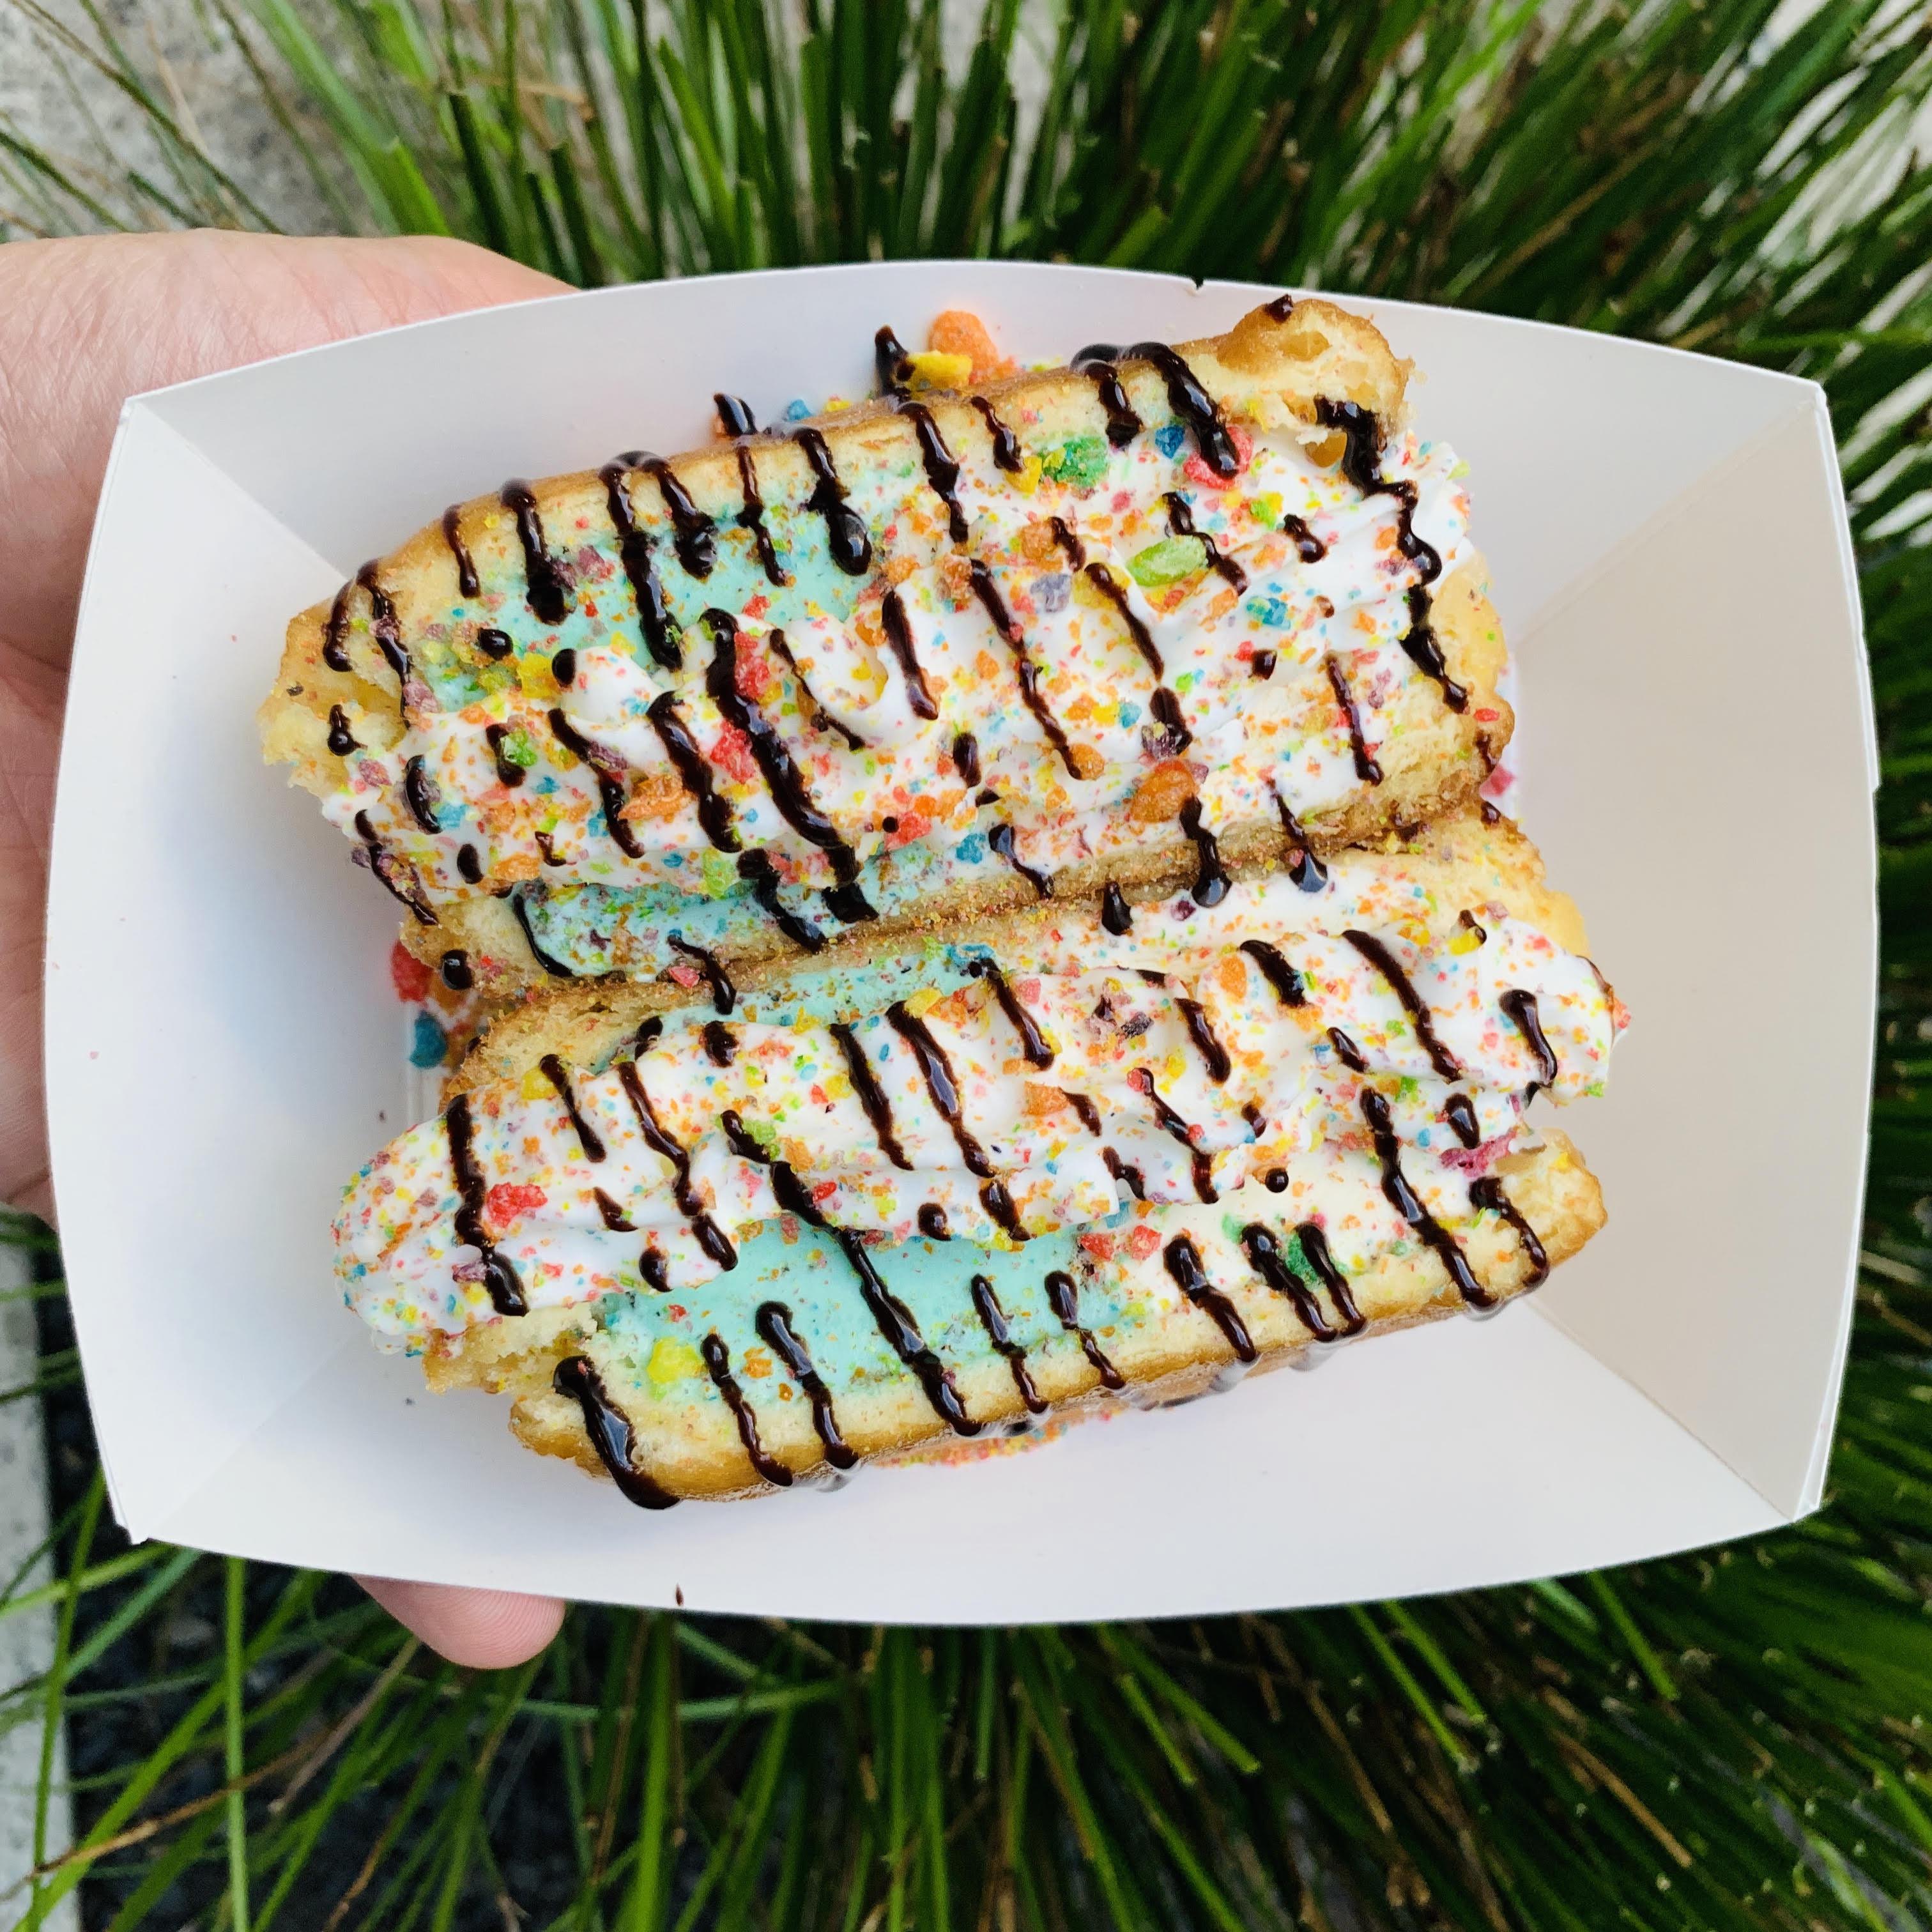 Milkbomb Is Now Dropping Ice Cream-Stuffed Doughnuts in Downtown Berkeley